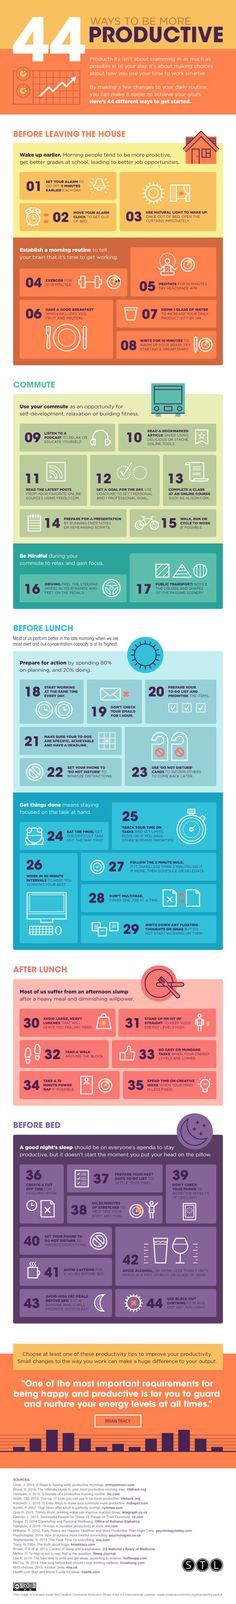 Read 44 Ways To Be More Productive - Do you fancy an infographic? There are a lot of them online, but if you want your own please visit http://www.linfografico.com/prezzi/ Online girano molte infografiche, se ne vuoi realizzare una tutta tua visita http://www.linfografico.com/prezzi/